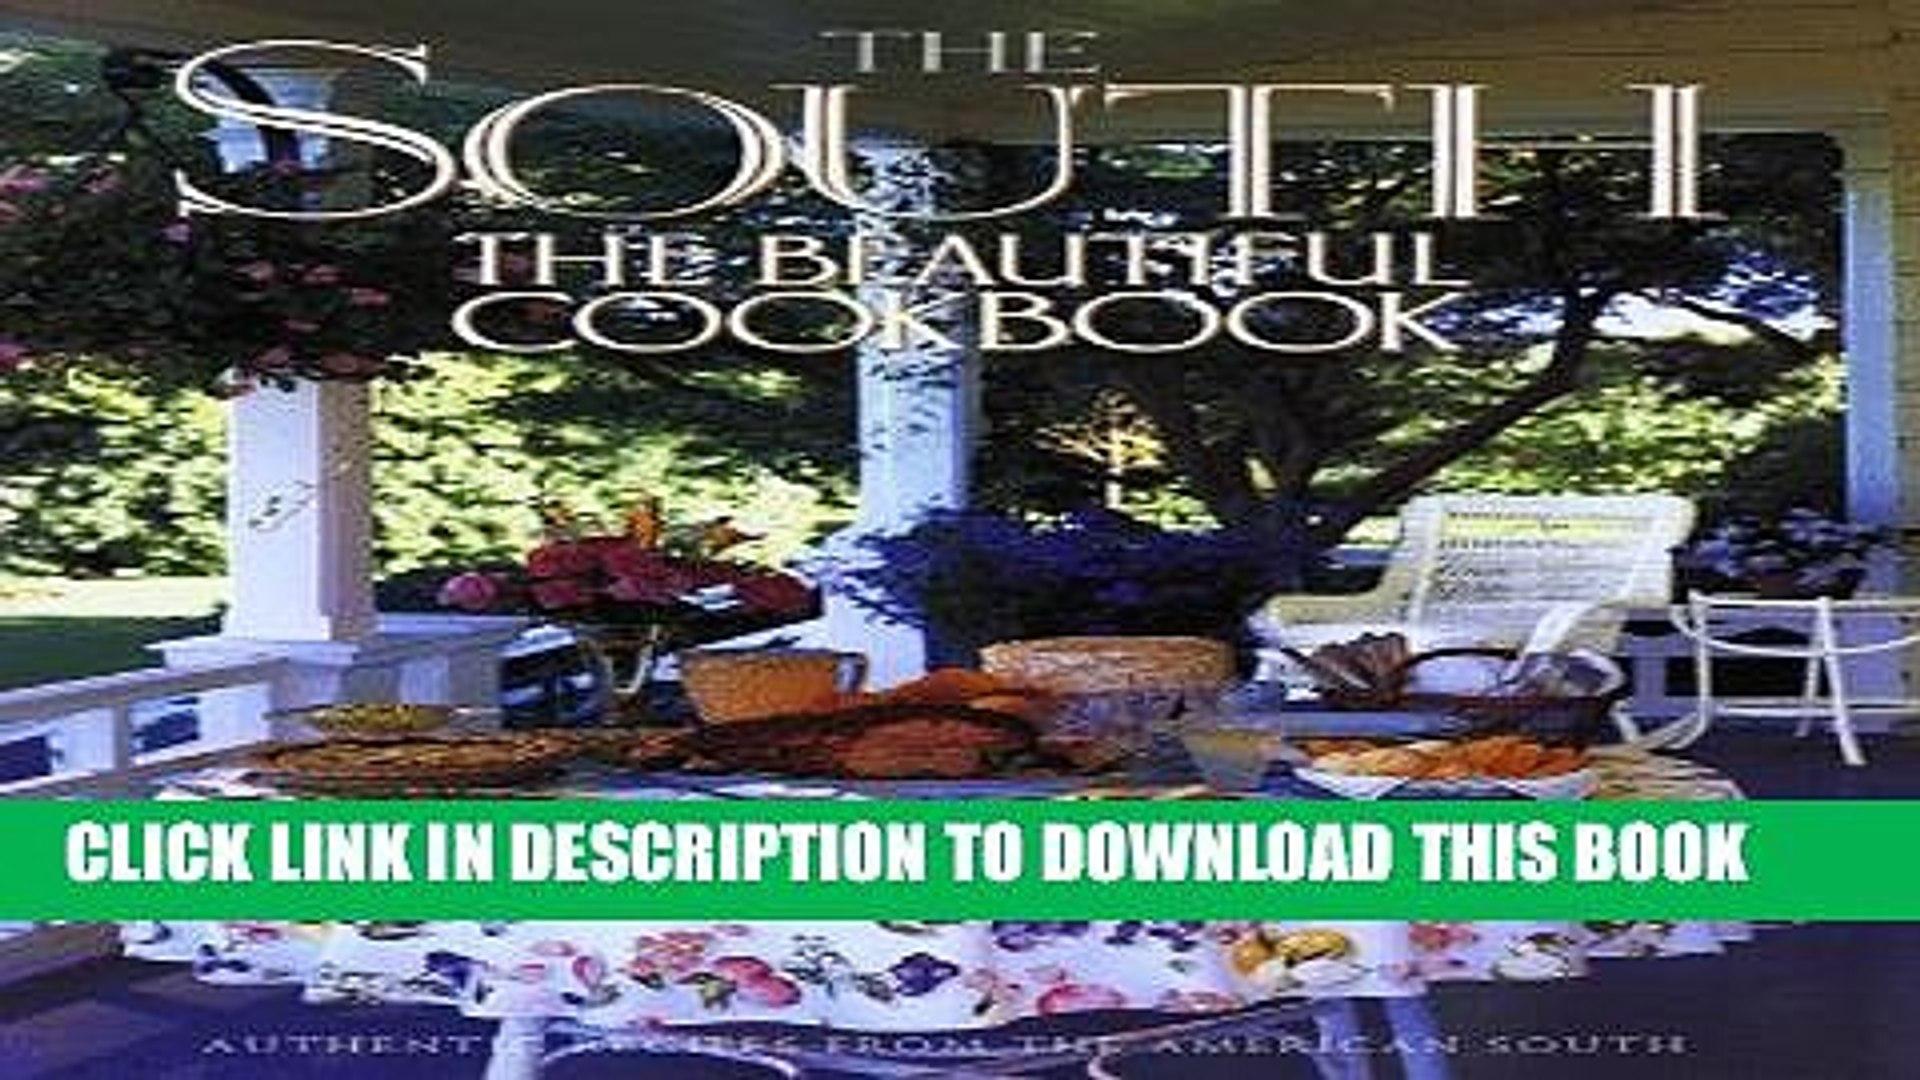 [PDF] The South The Beautiful Cookbook Full Collection[PDF] The South The Beautiful Cookbook Full